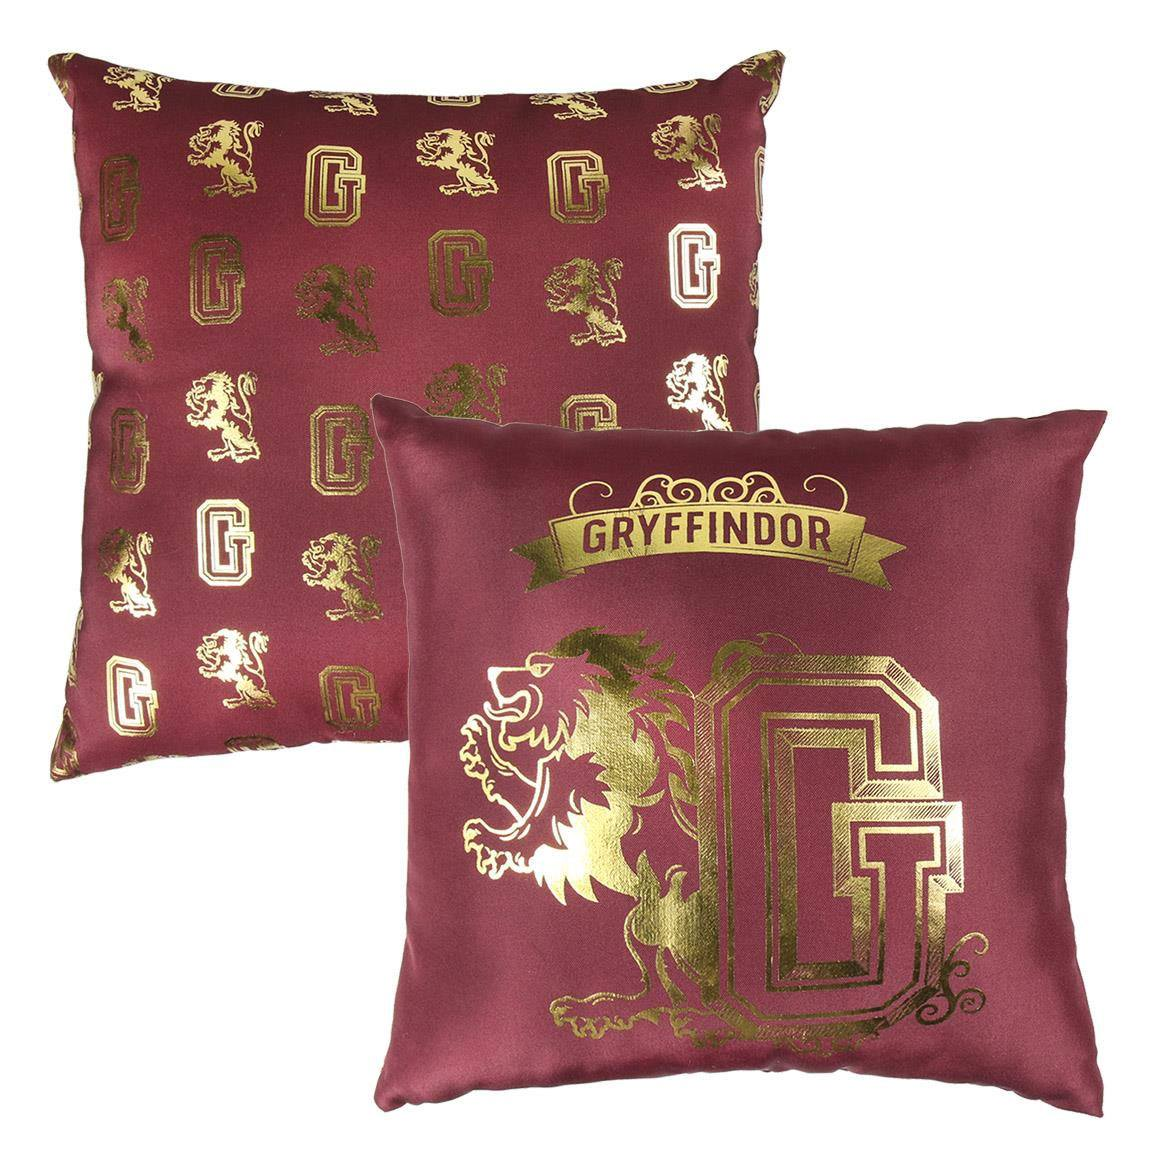 Harry Potter Premium Pillow Gryffindor 40 x 40 cm